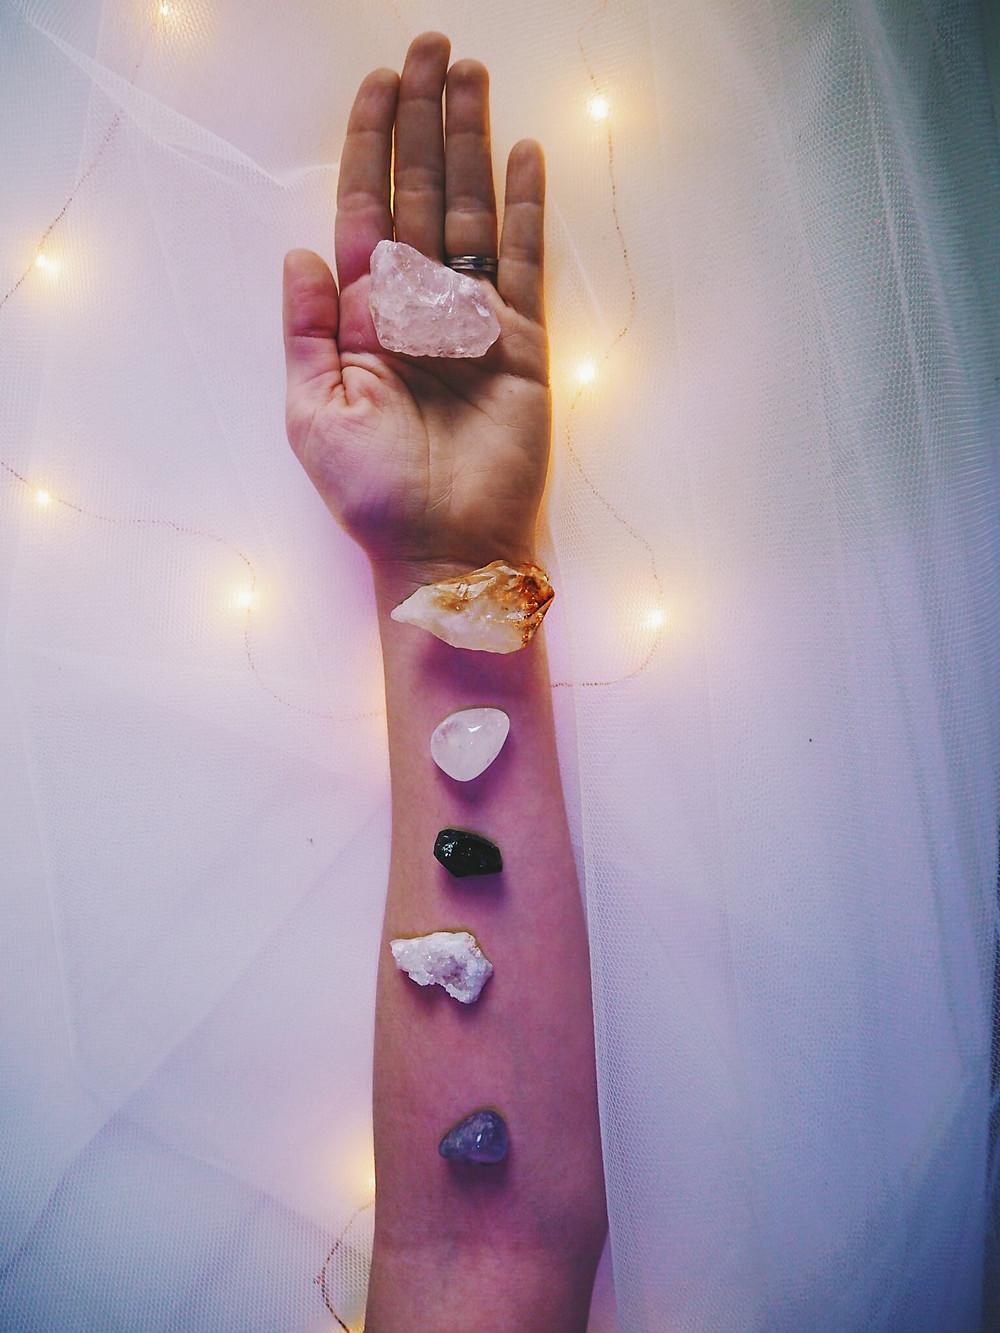 Crystal arm. Rose quartz, Citrine, Clear quartz, Black tourmaline, clear quartz, amethyst